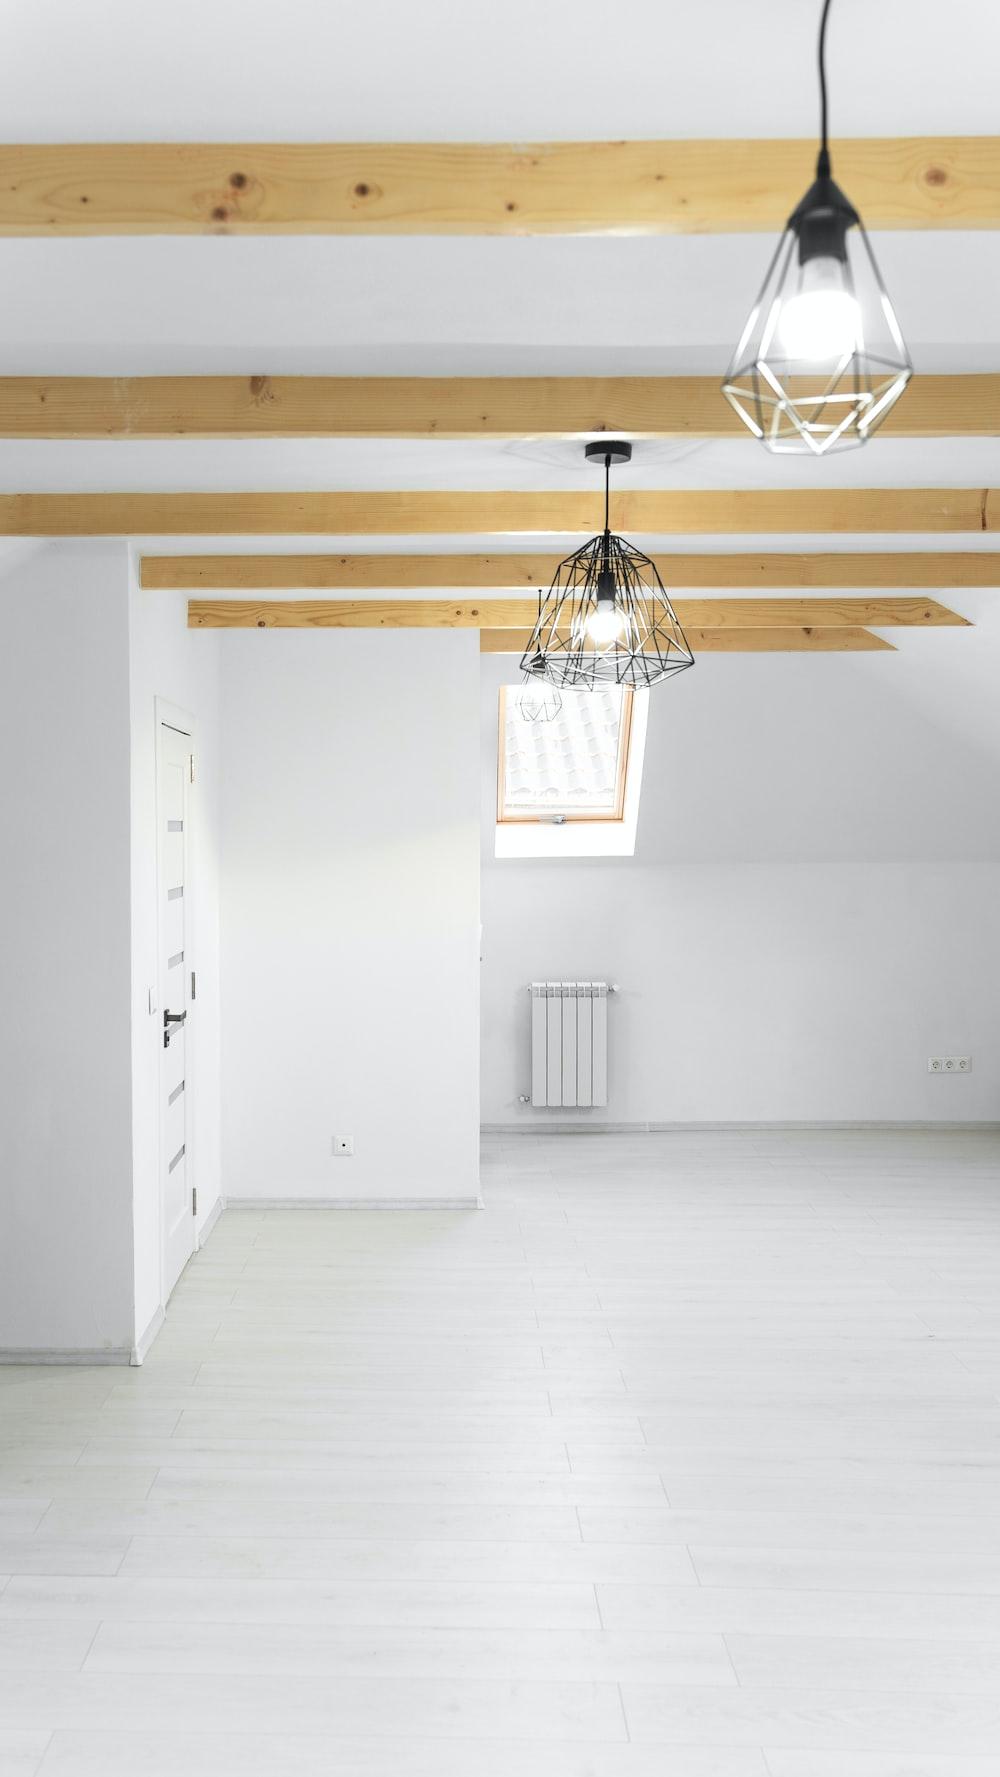 white ceiling fan turned off